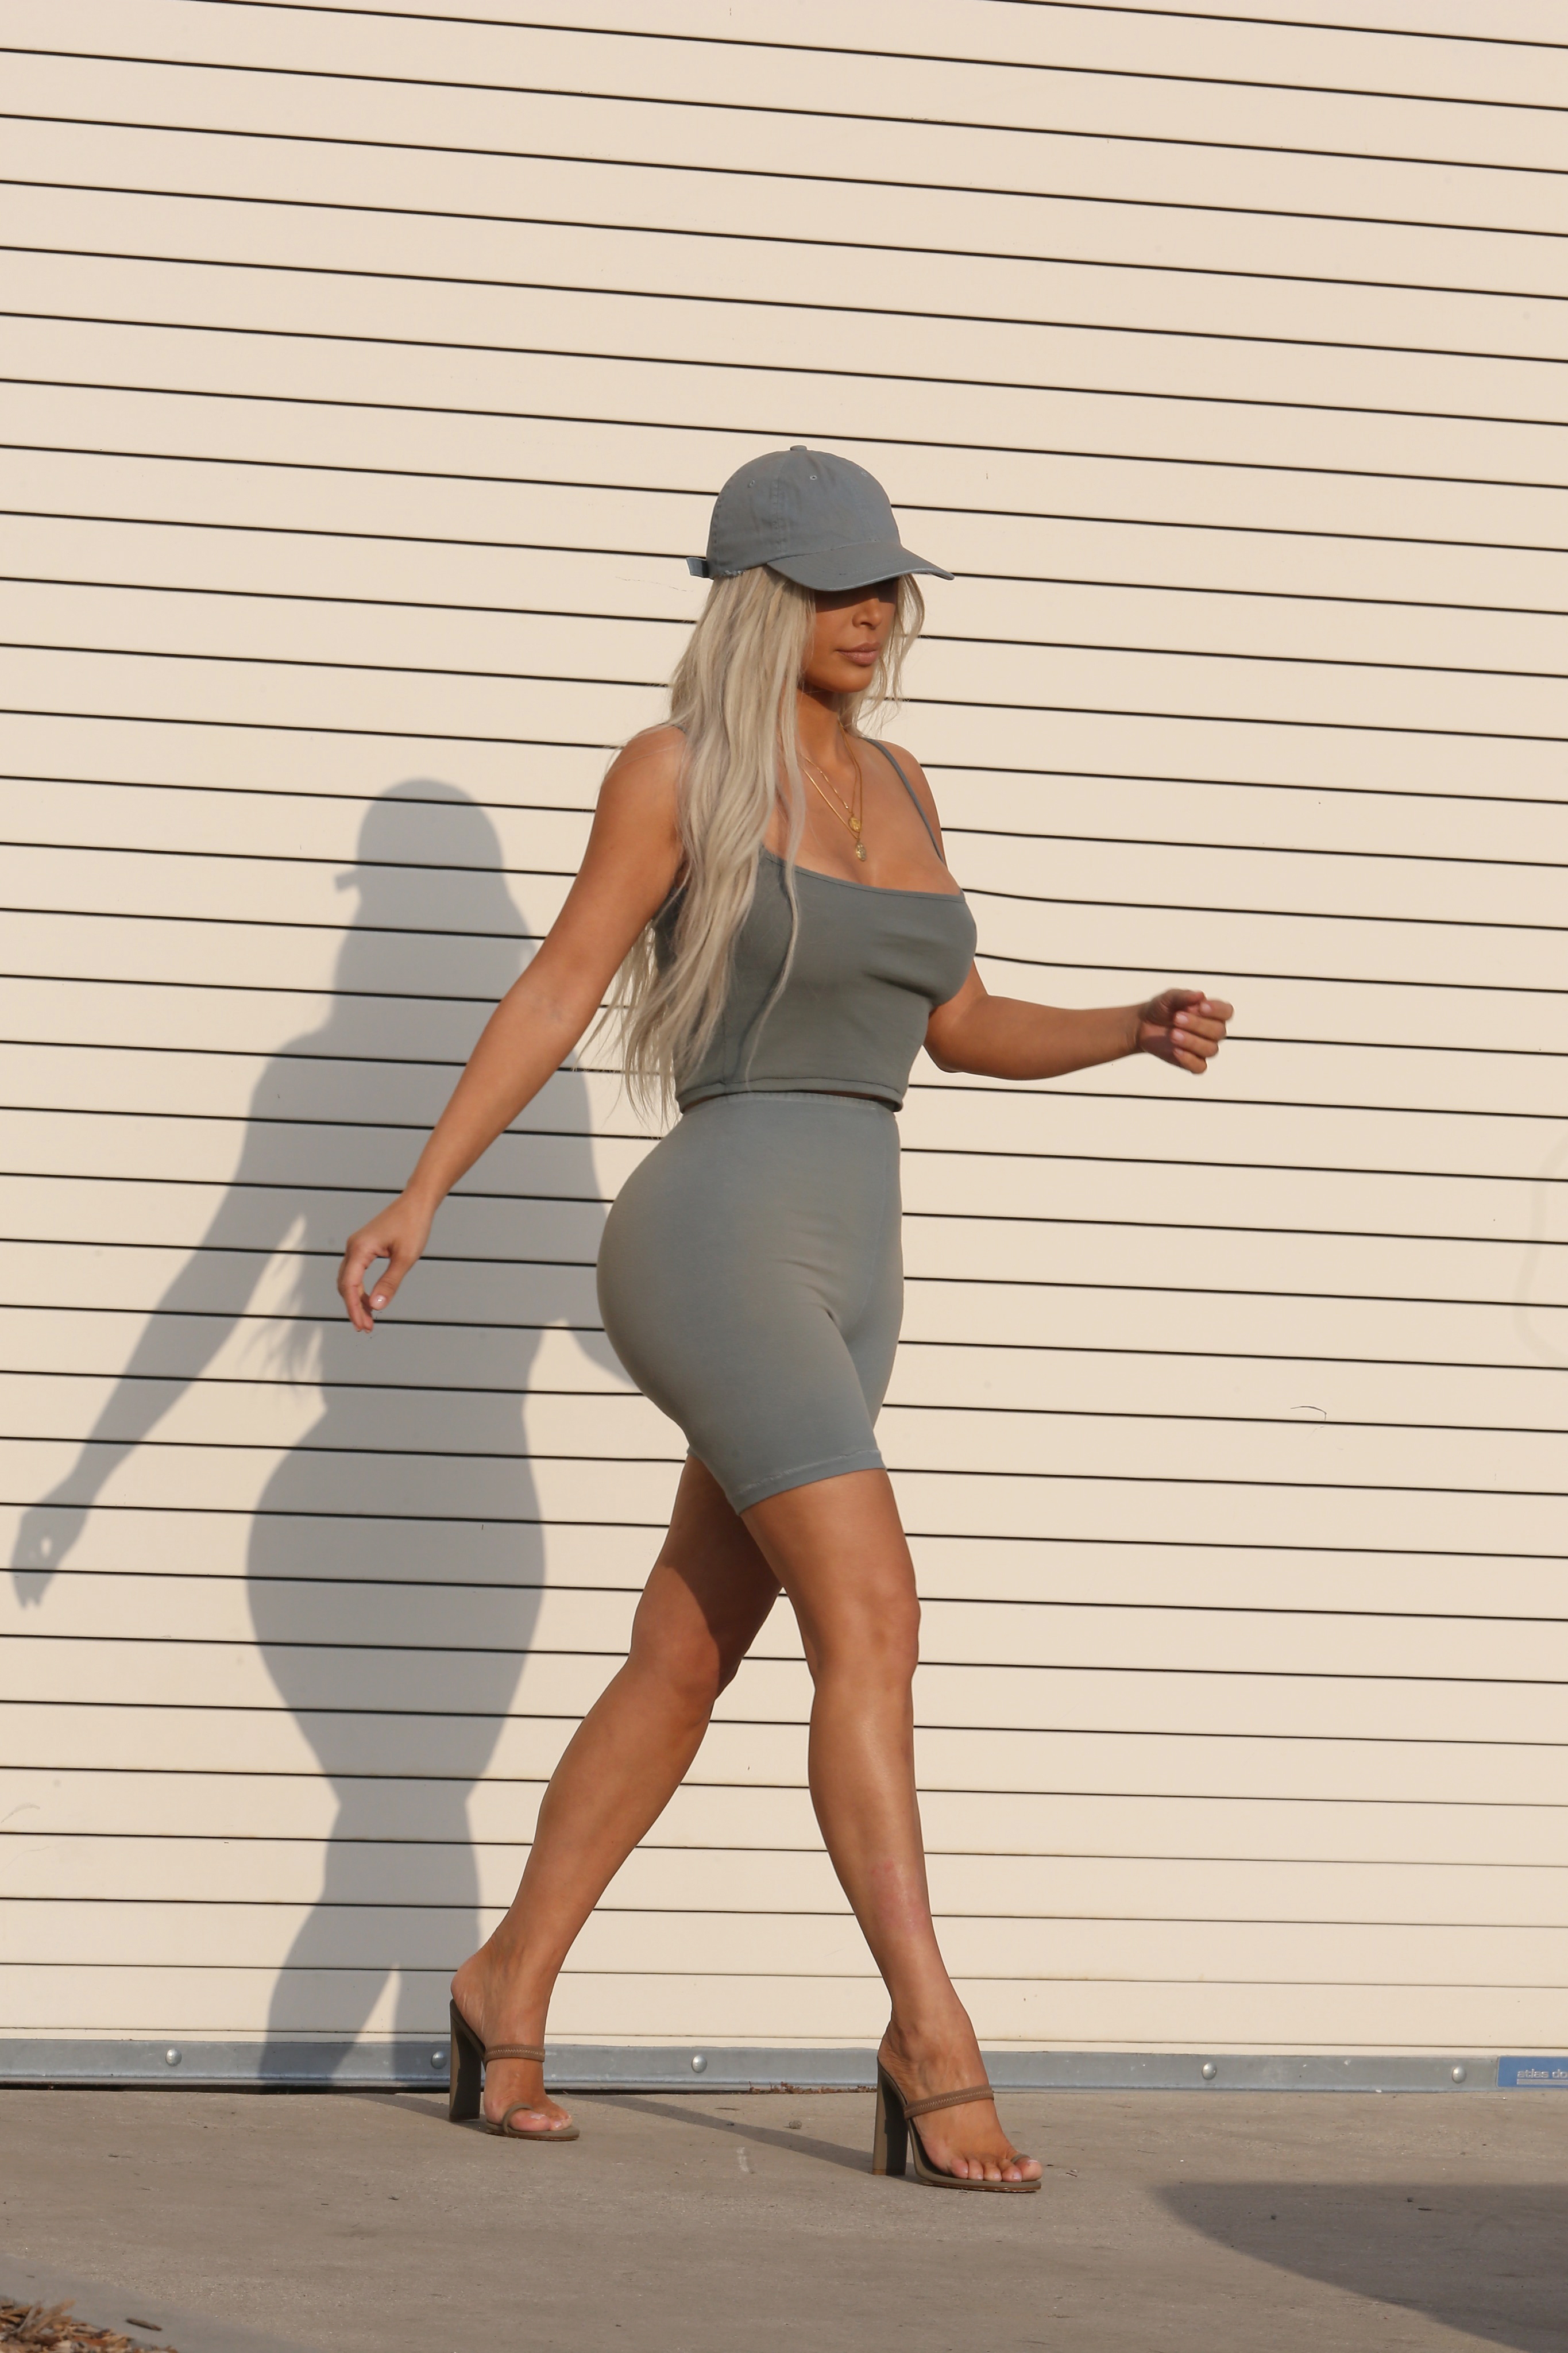 36b46f93759ba Kim Kardashian teases Kanye West s new Yeezy collection -- check out ...